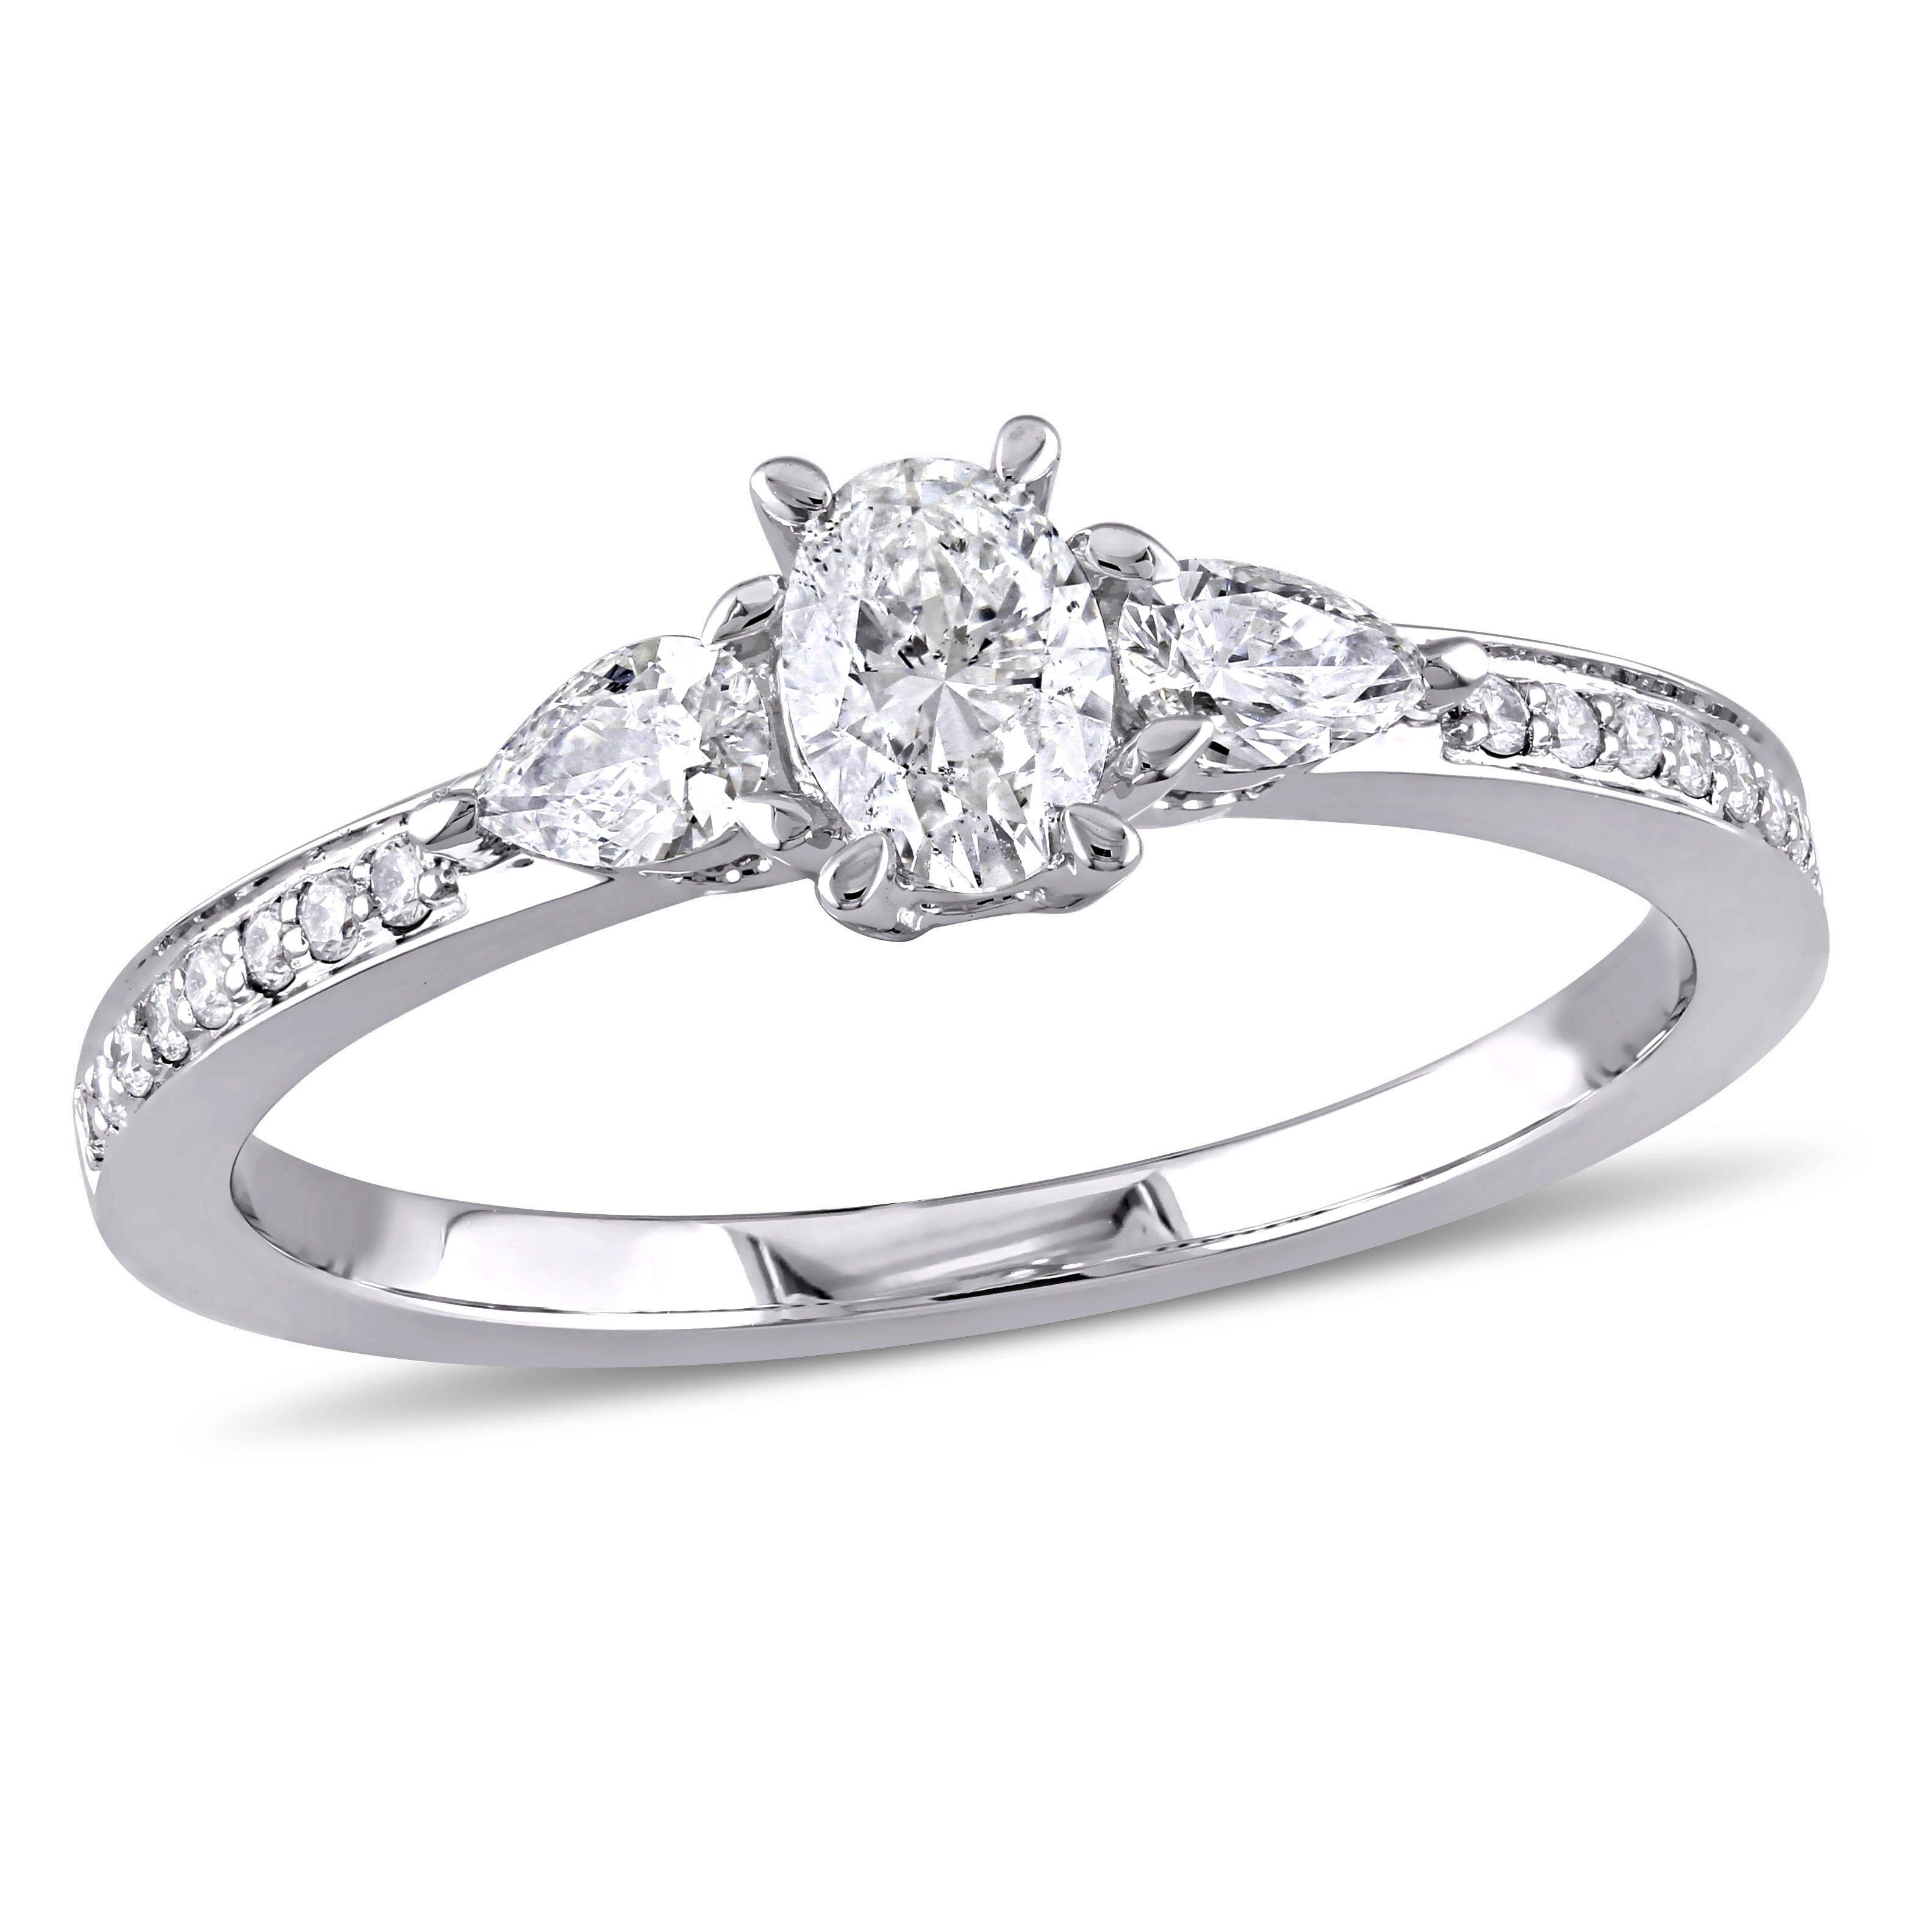 Engagement Wedding Ring 5.25 Ct Oval Cut Diamond 14K White Gold Finish